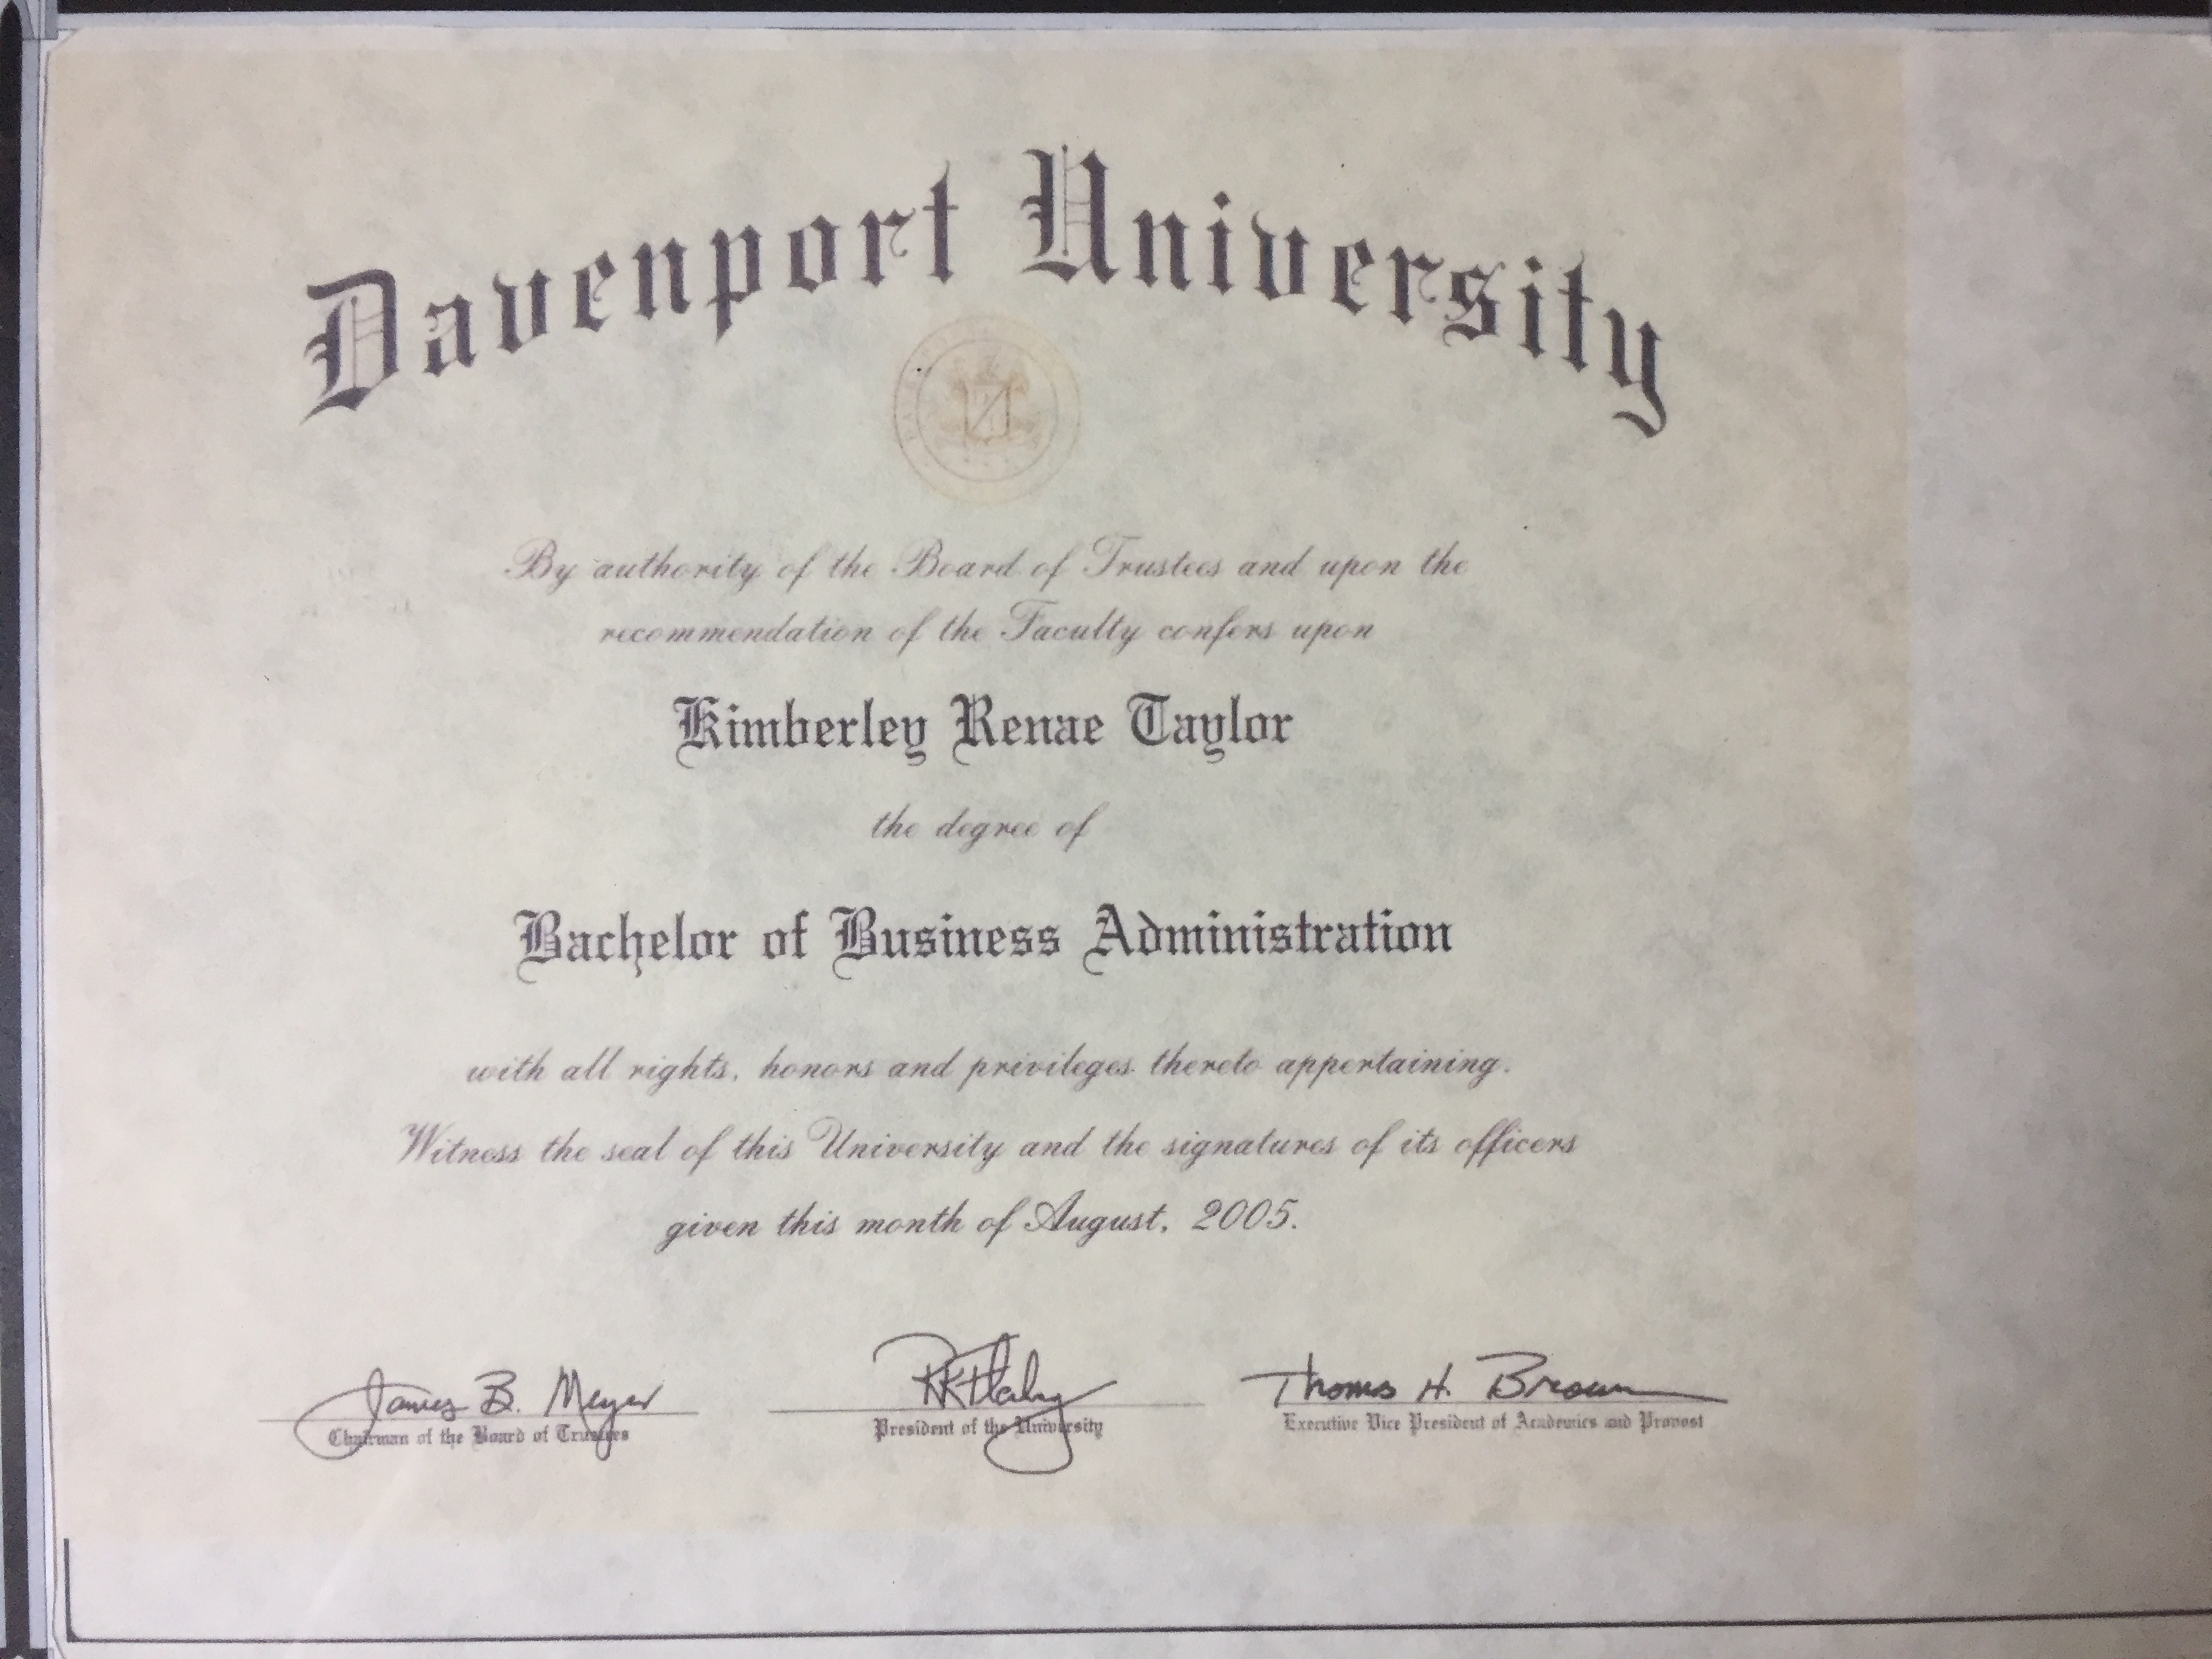 Davenport University BA